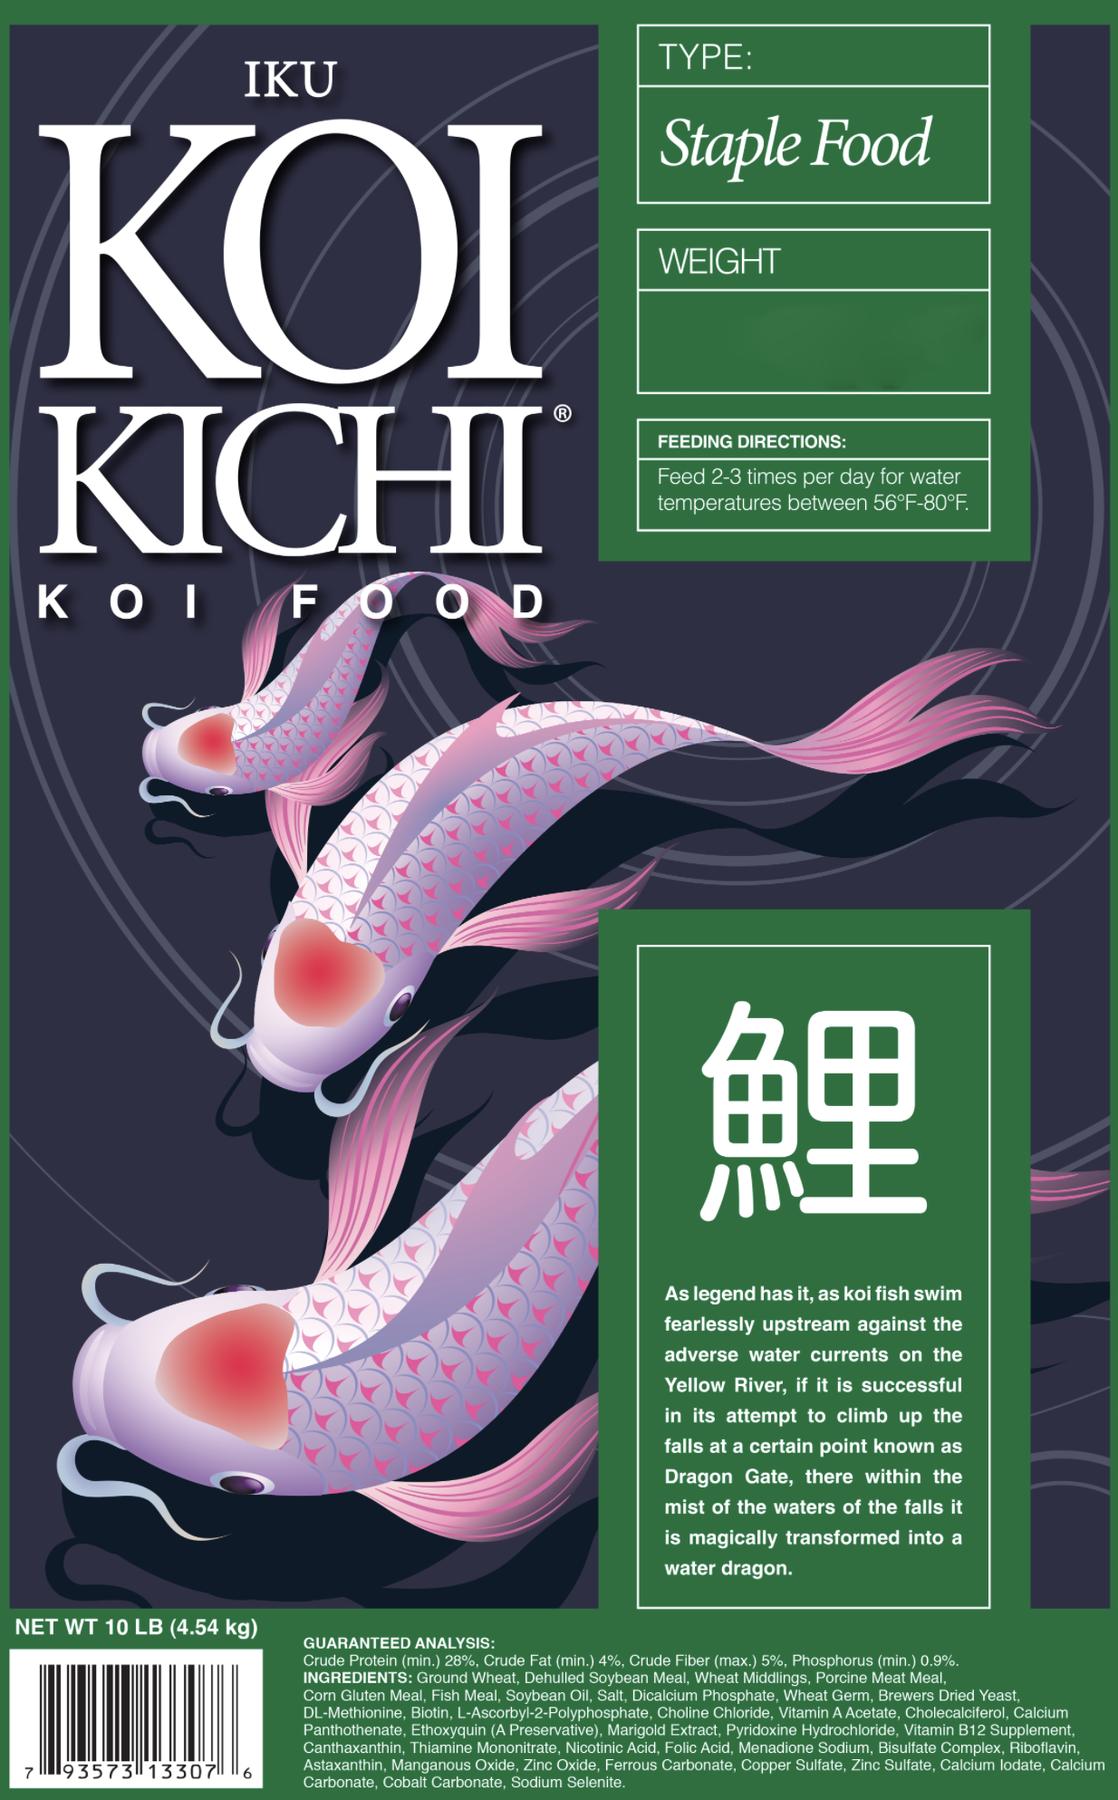 Iku Koi Kichi Staple Koi Fish Food - 5 lbs.